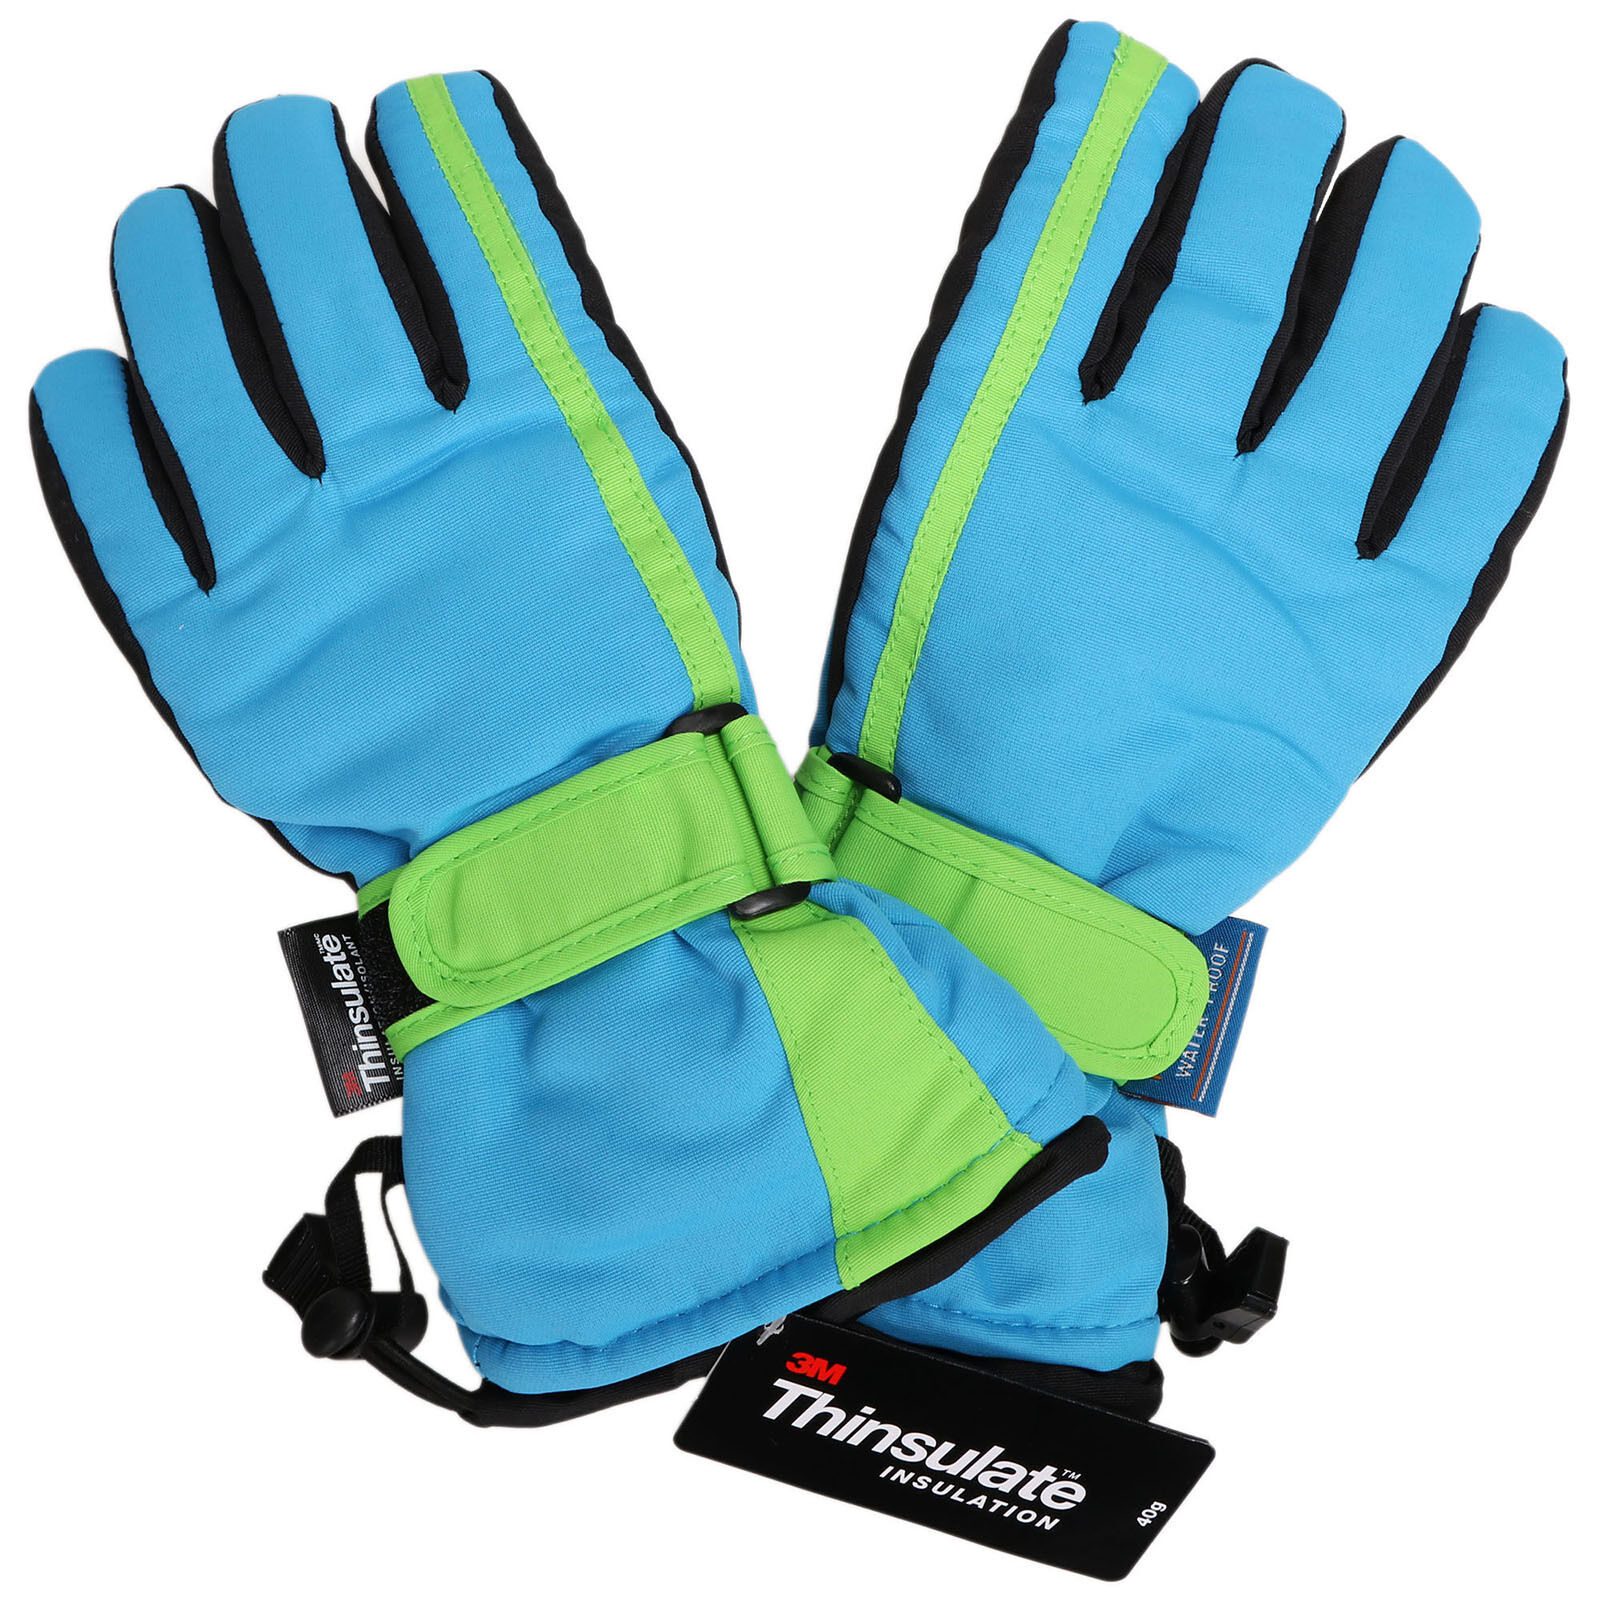 Boys Kids Snow Ski Glove Waterproof Thinsulate Winter Warm M